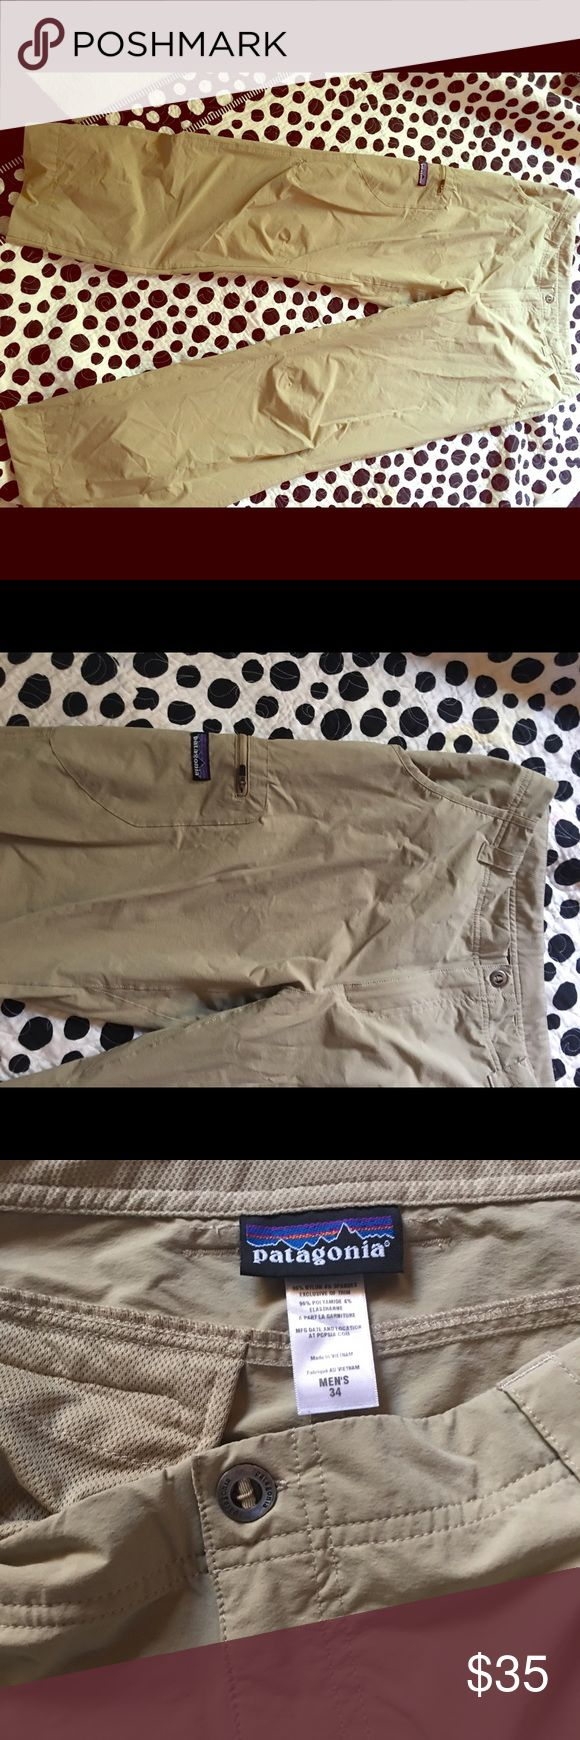 Men's Patagonia pants Like new men's size 34 Patagonia wind pants. Patagonia Pants